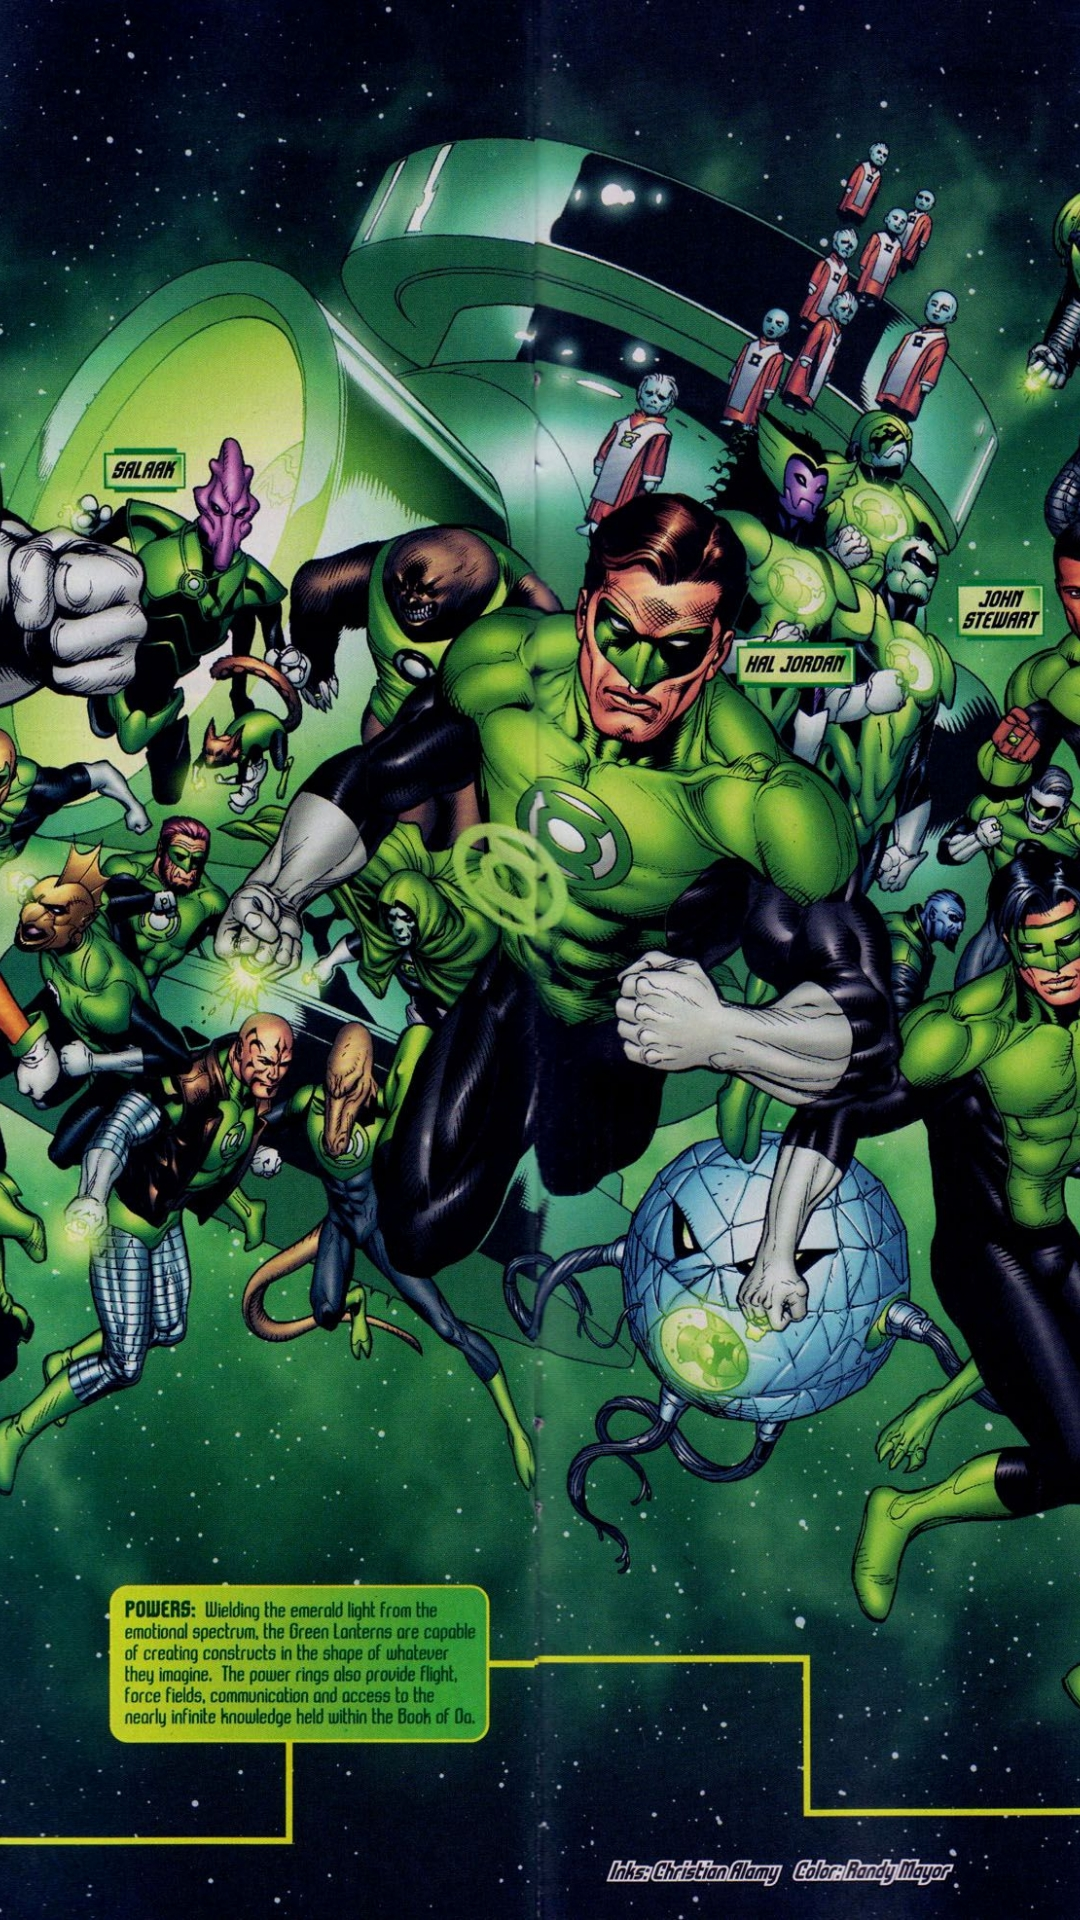 download Green Lantern Corps Wallpapers Top Green Lantern 1080x1920